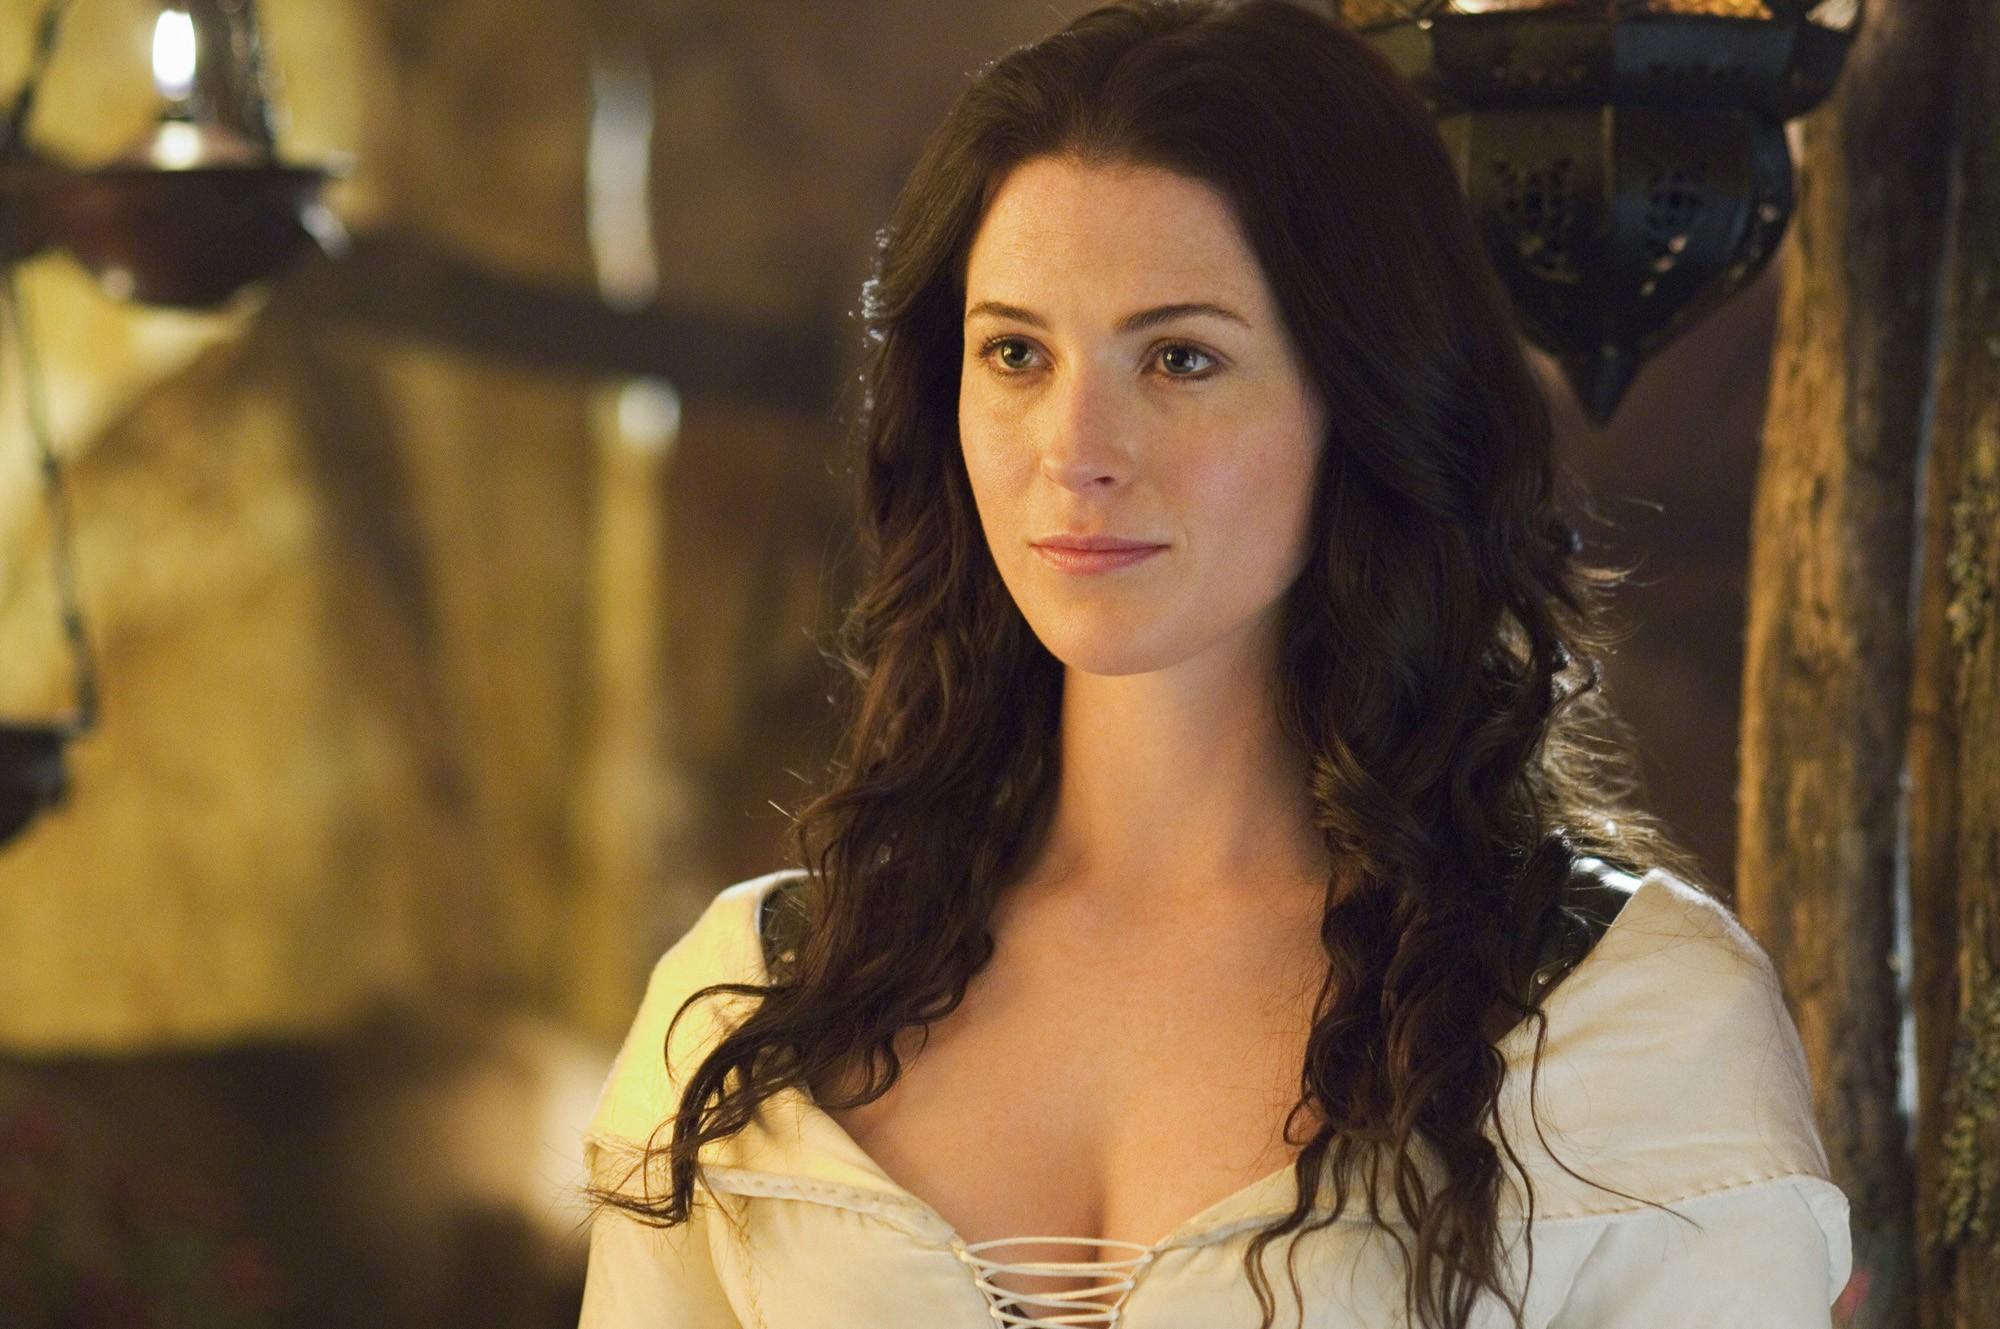 Who is bridget regan from legend of the seeker dating